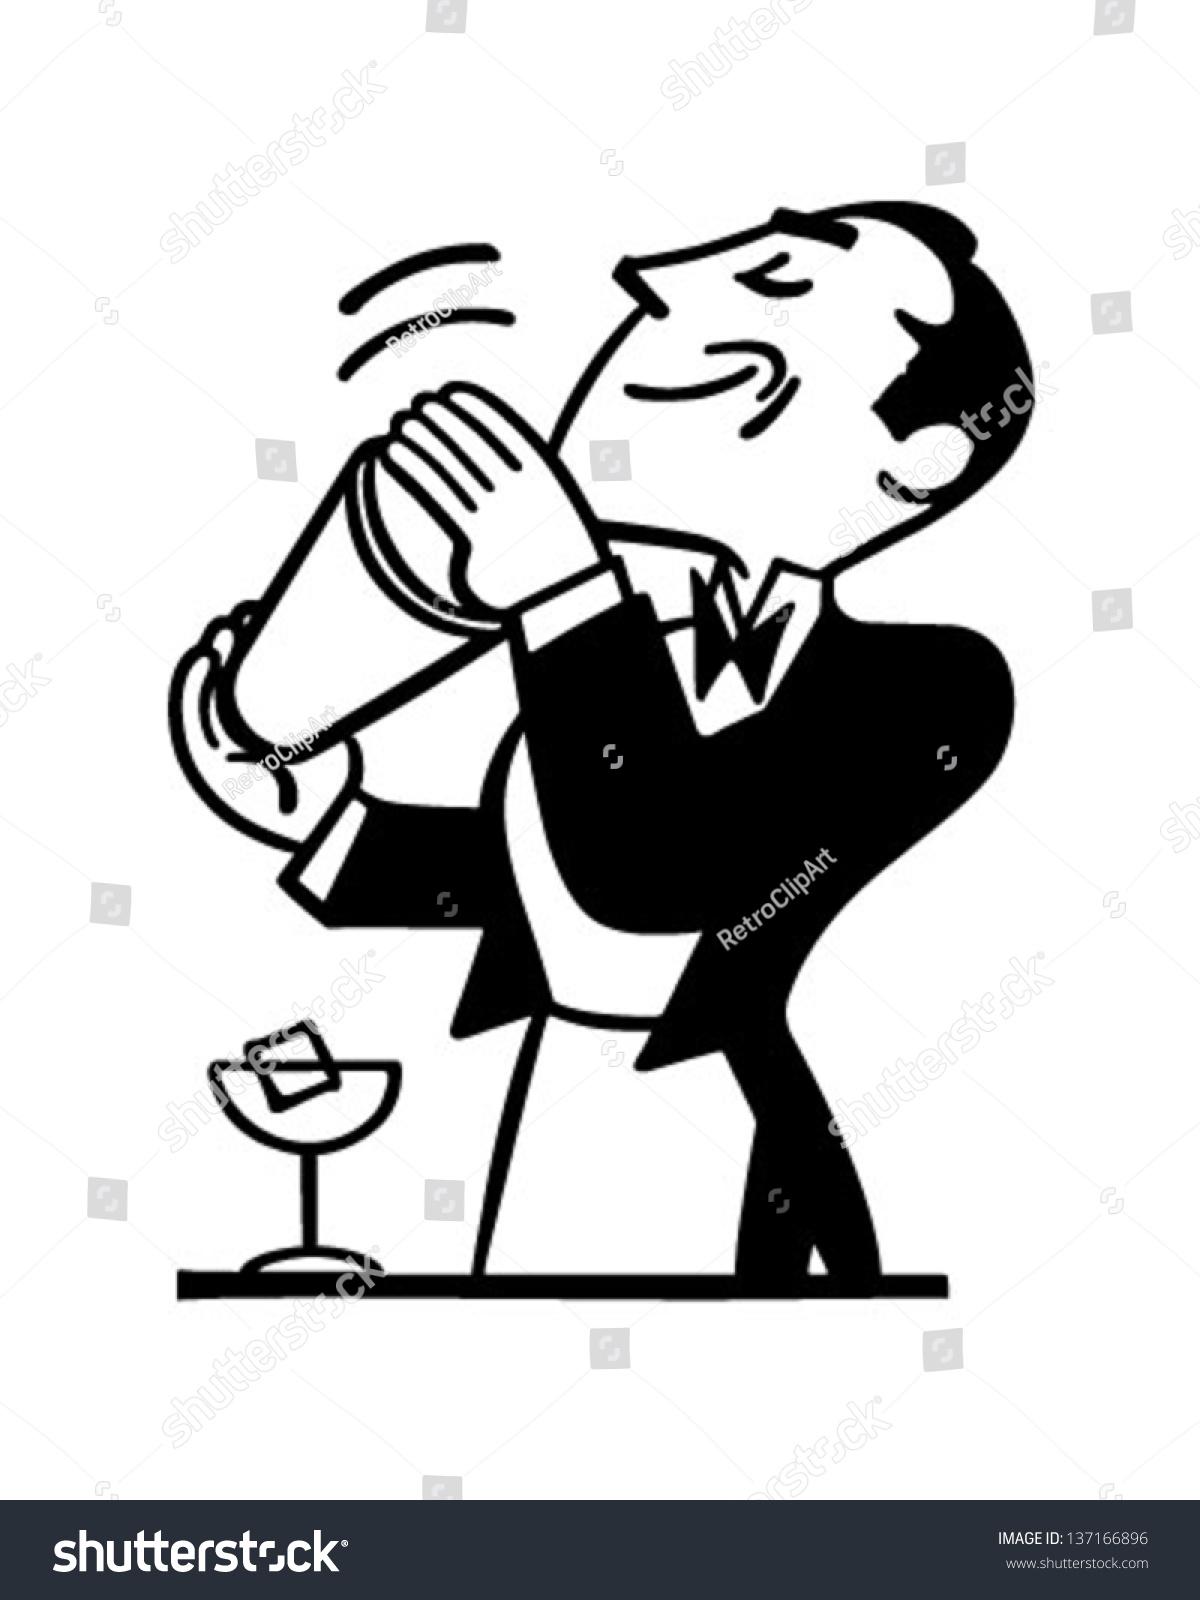 Bartender Mixing Drink Retro Clip Art Stock Vector 137166896 ...